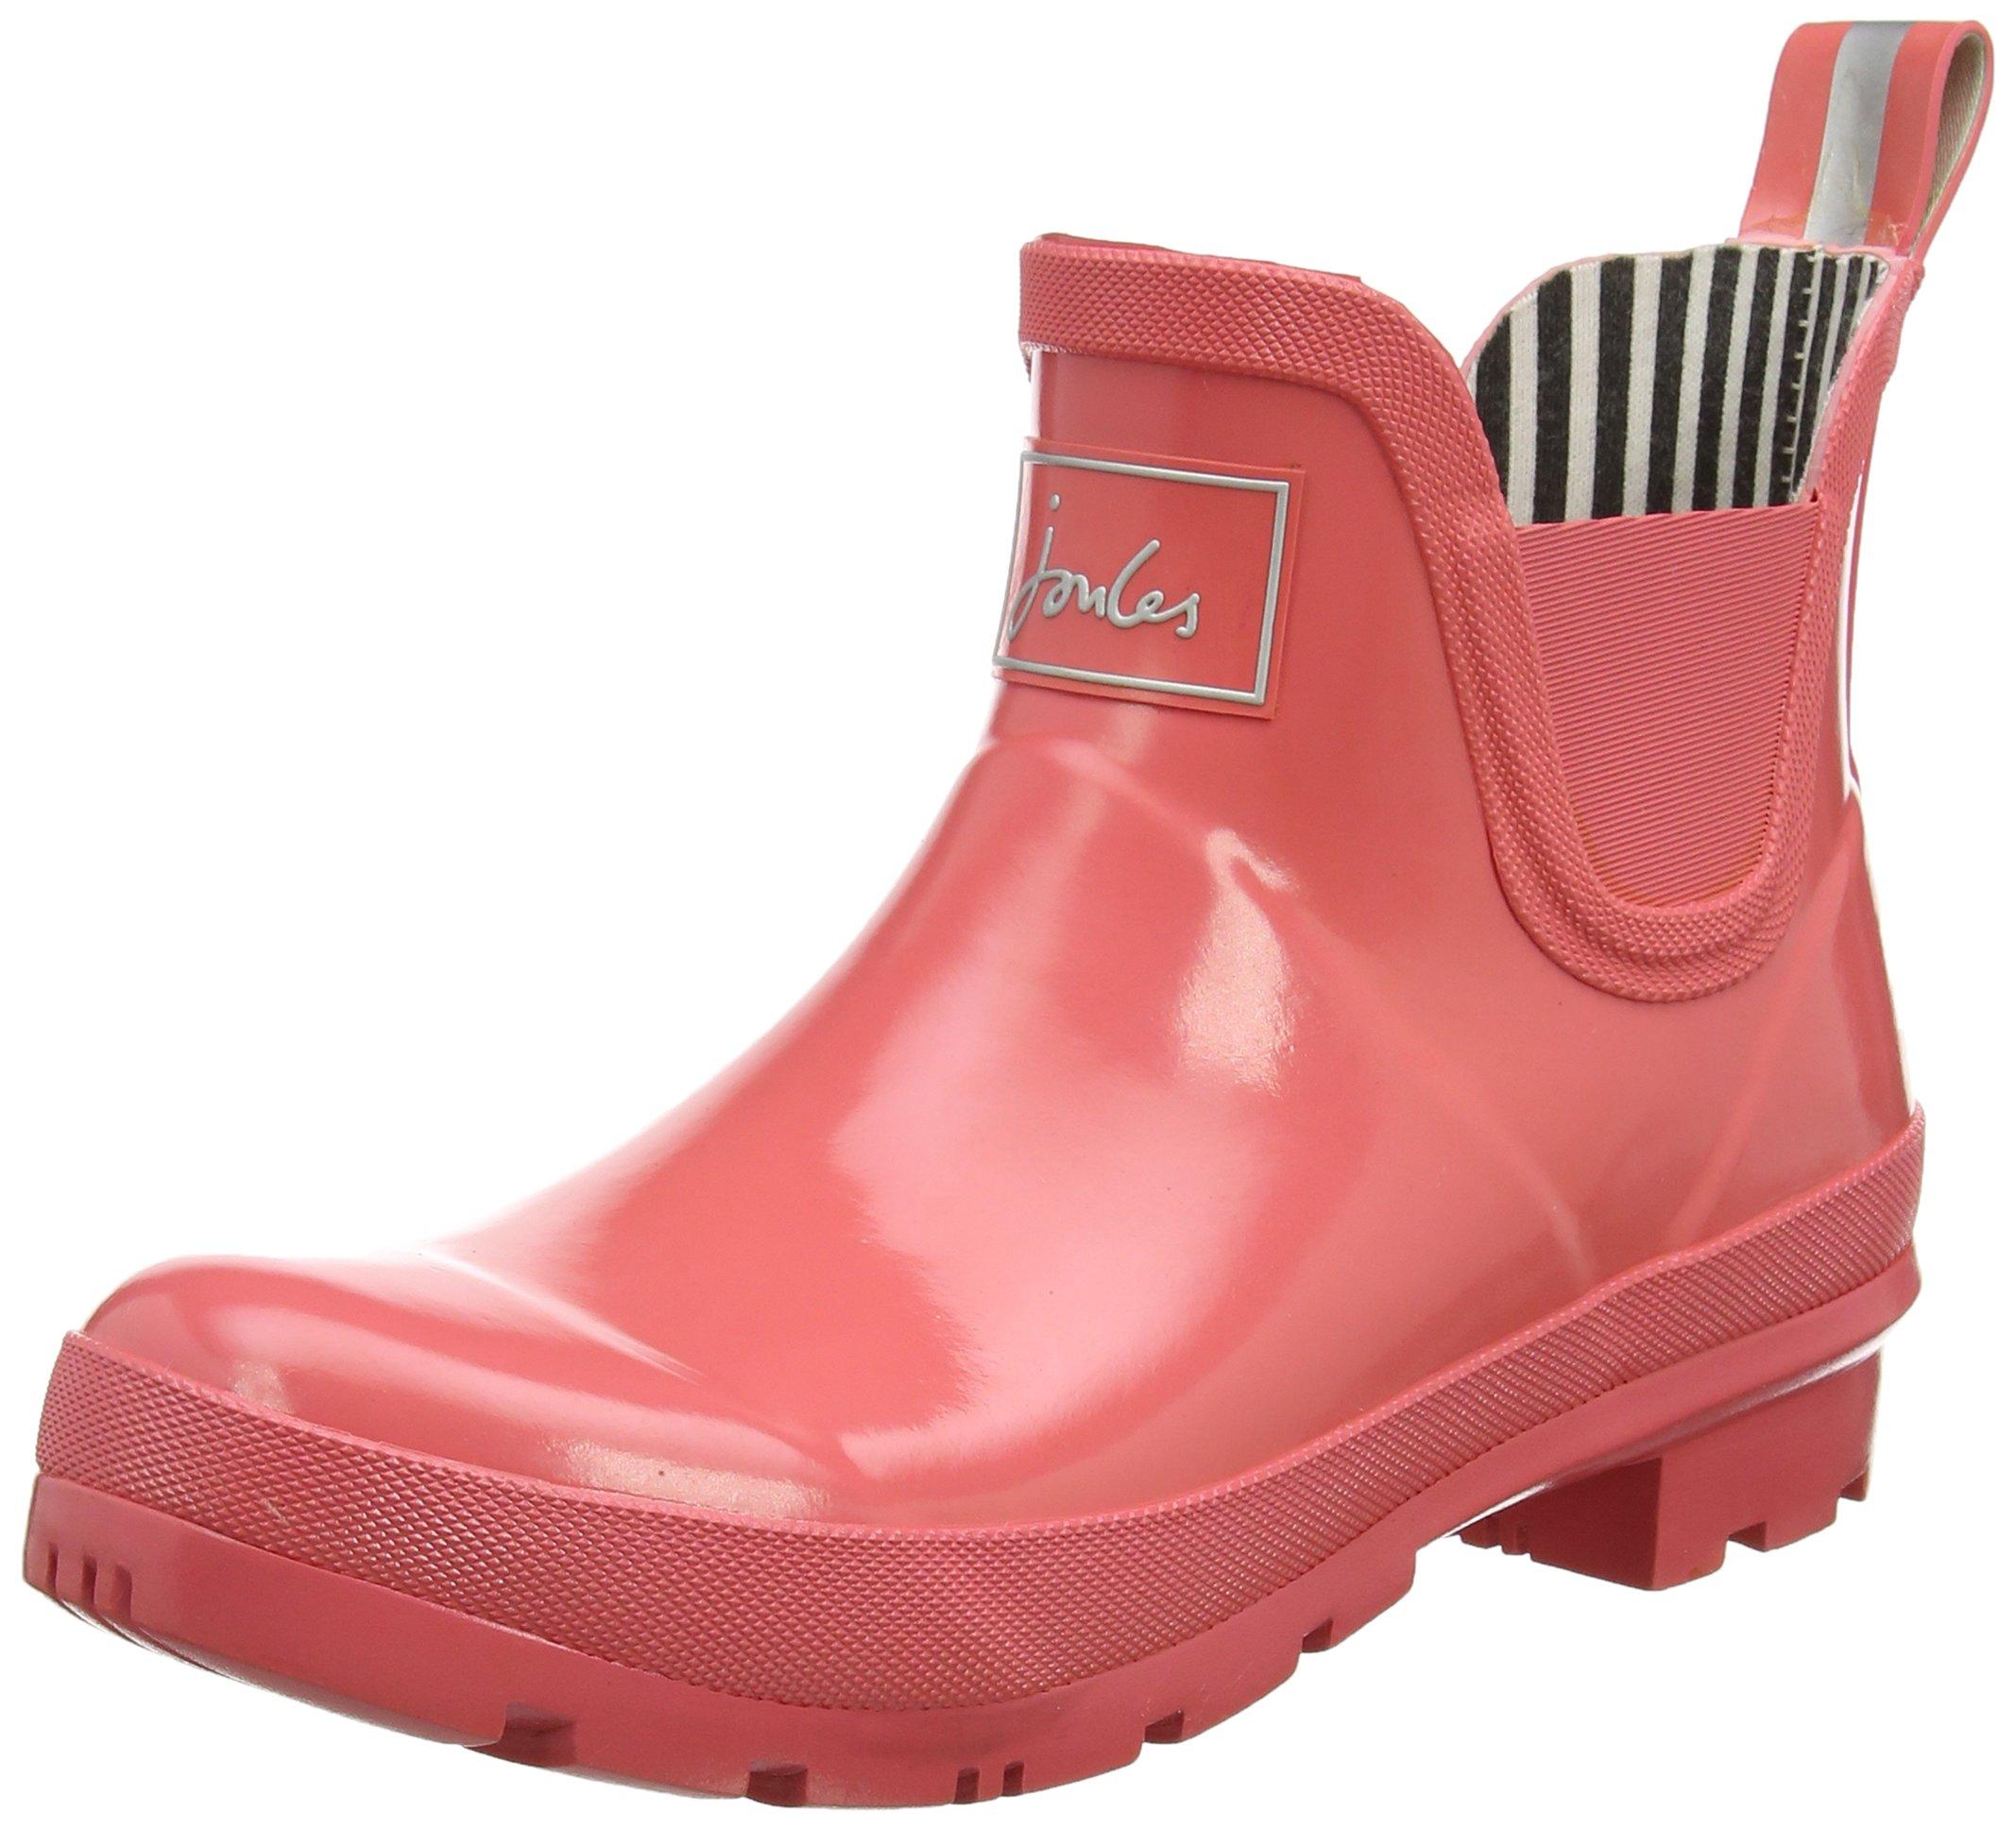 Joules Women's Wellibob Chelsea Boot Red Sky Rubber 7 B US